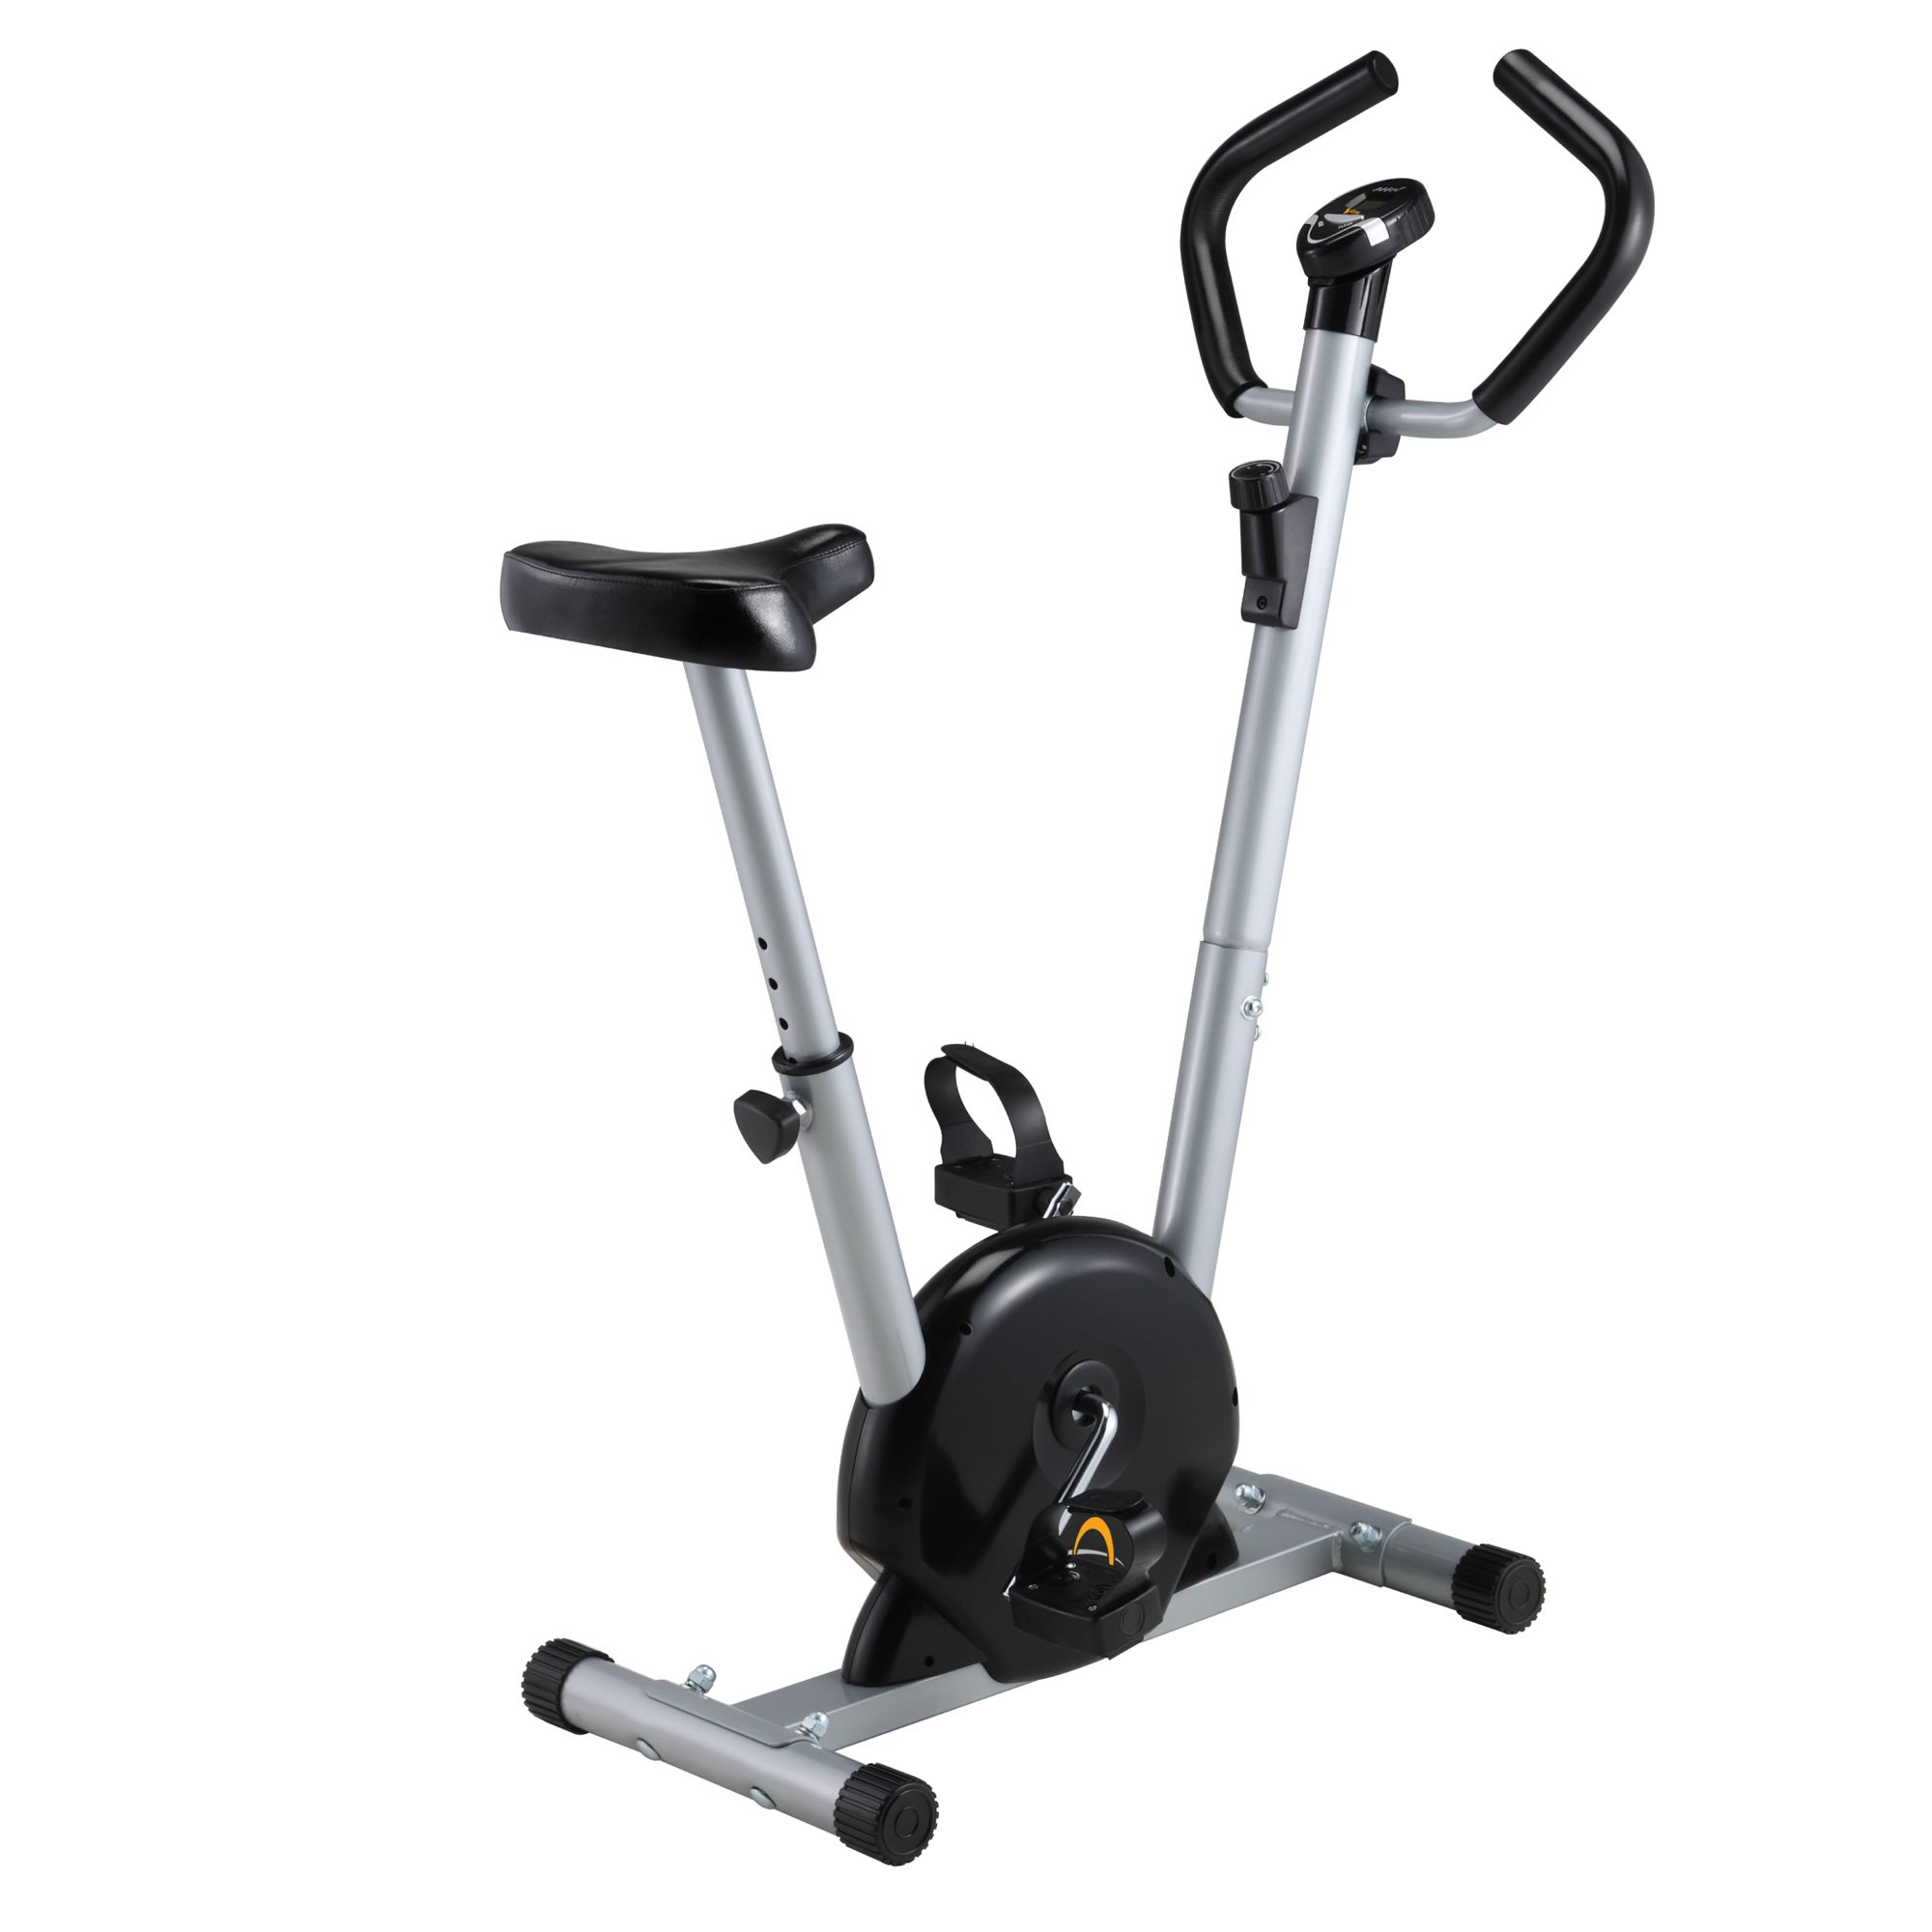 V-fit Fit-Start Exercise Bike